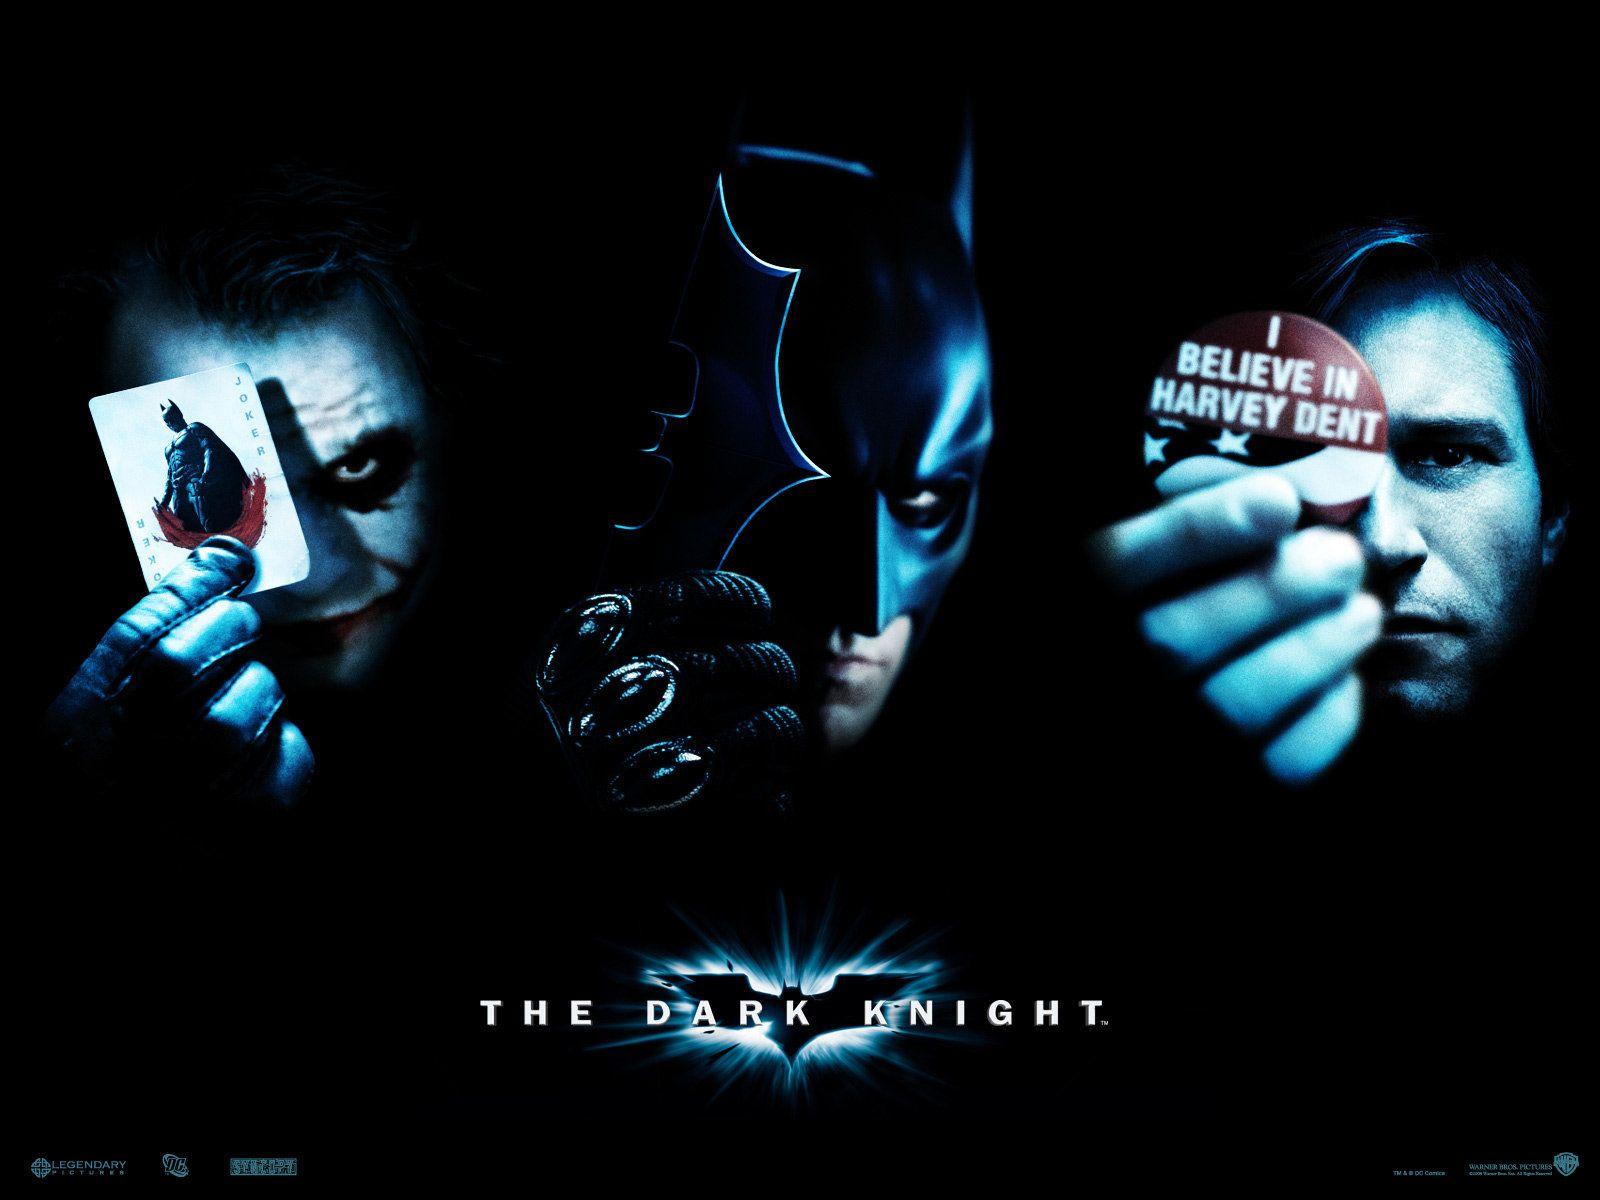 Batman Harvey Joker Faces Poster Wallpaper 1600x1200